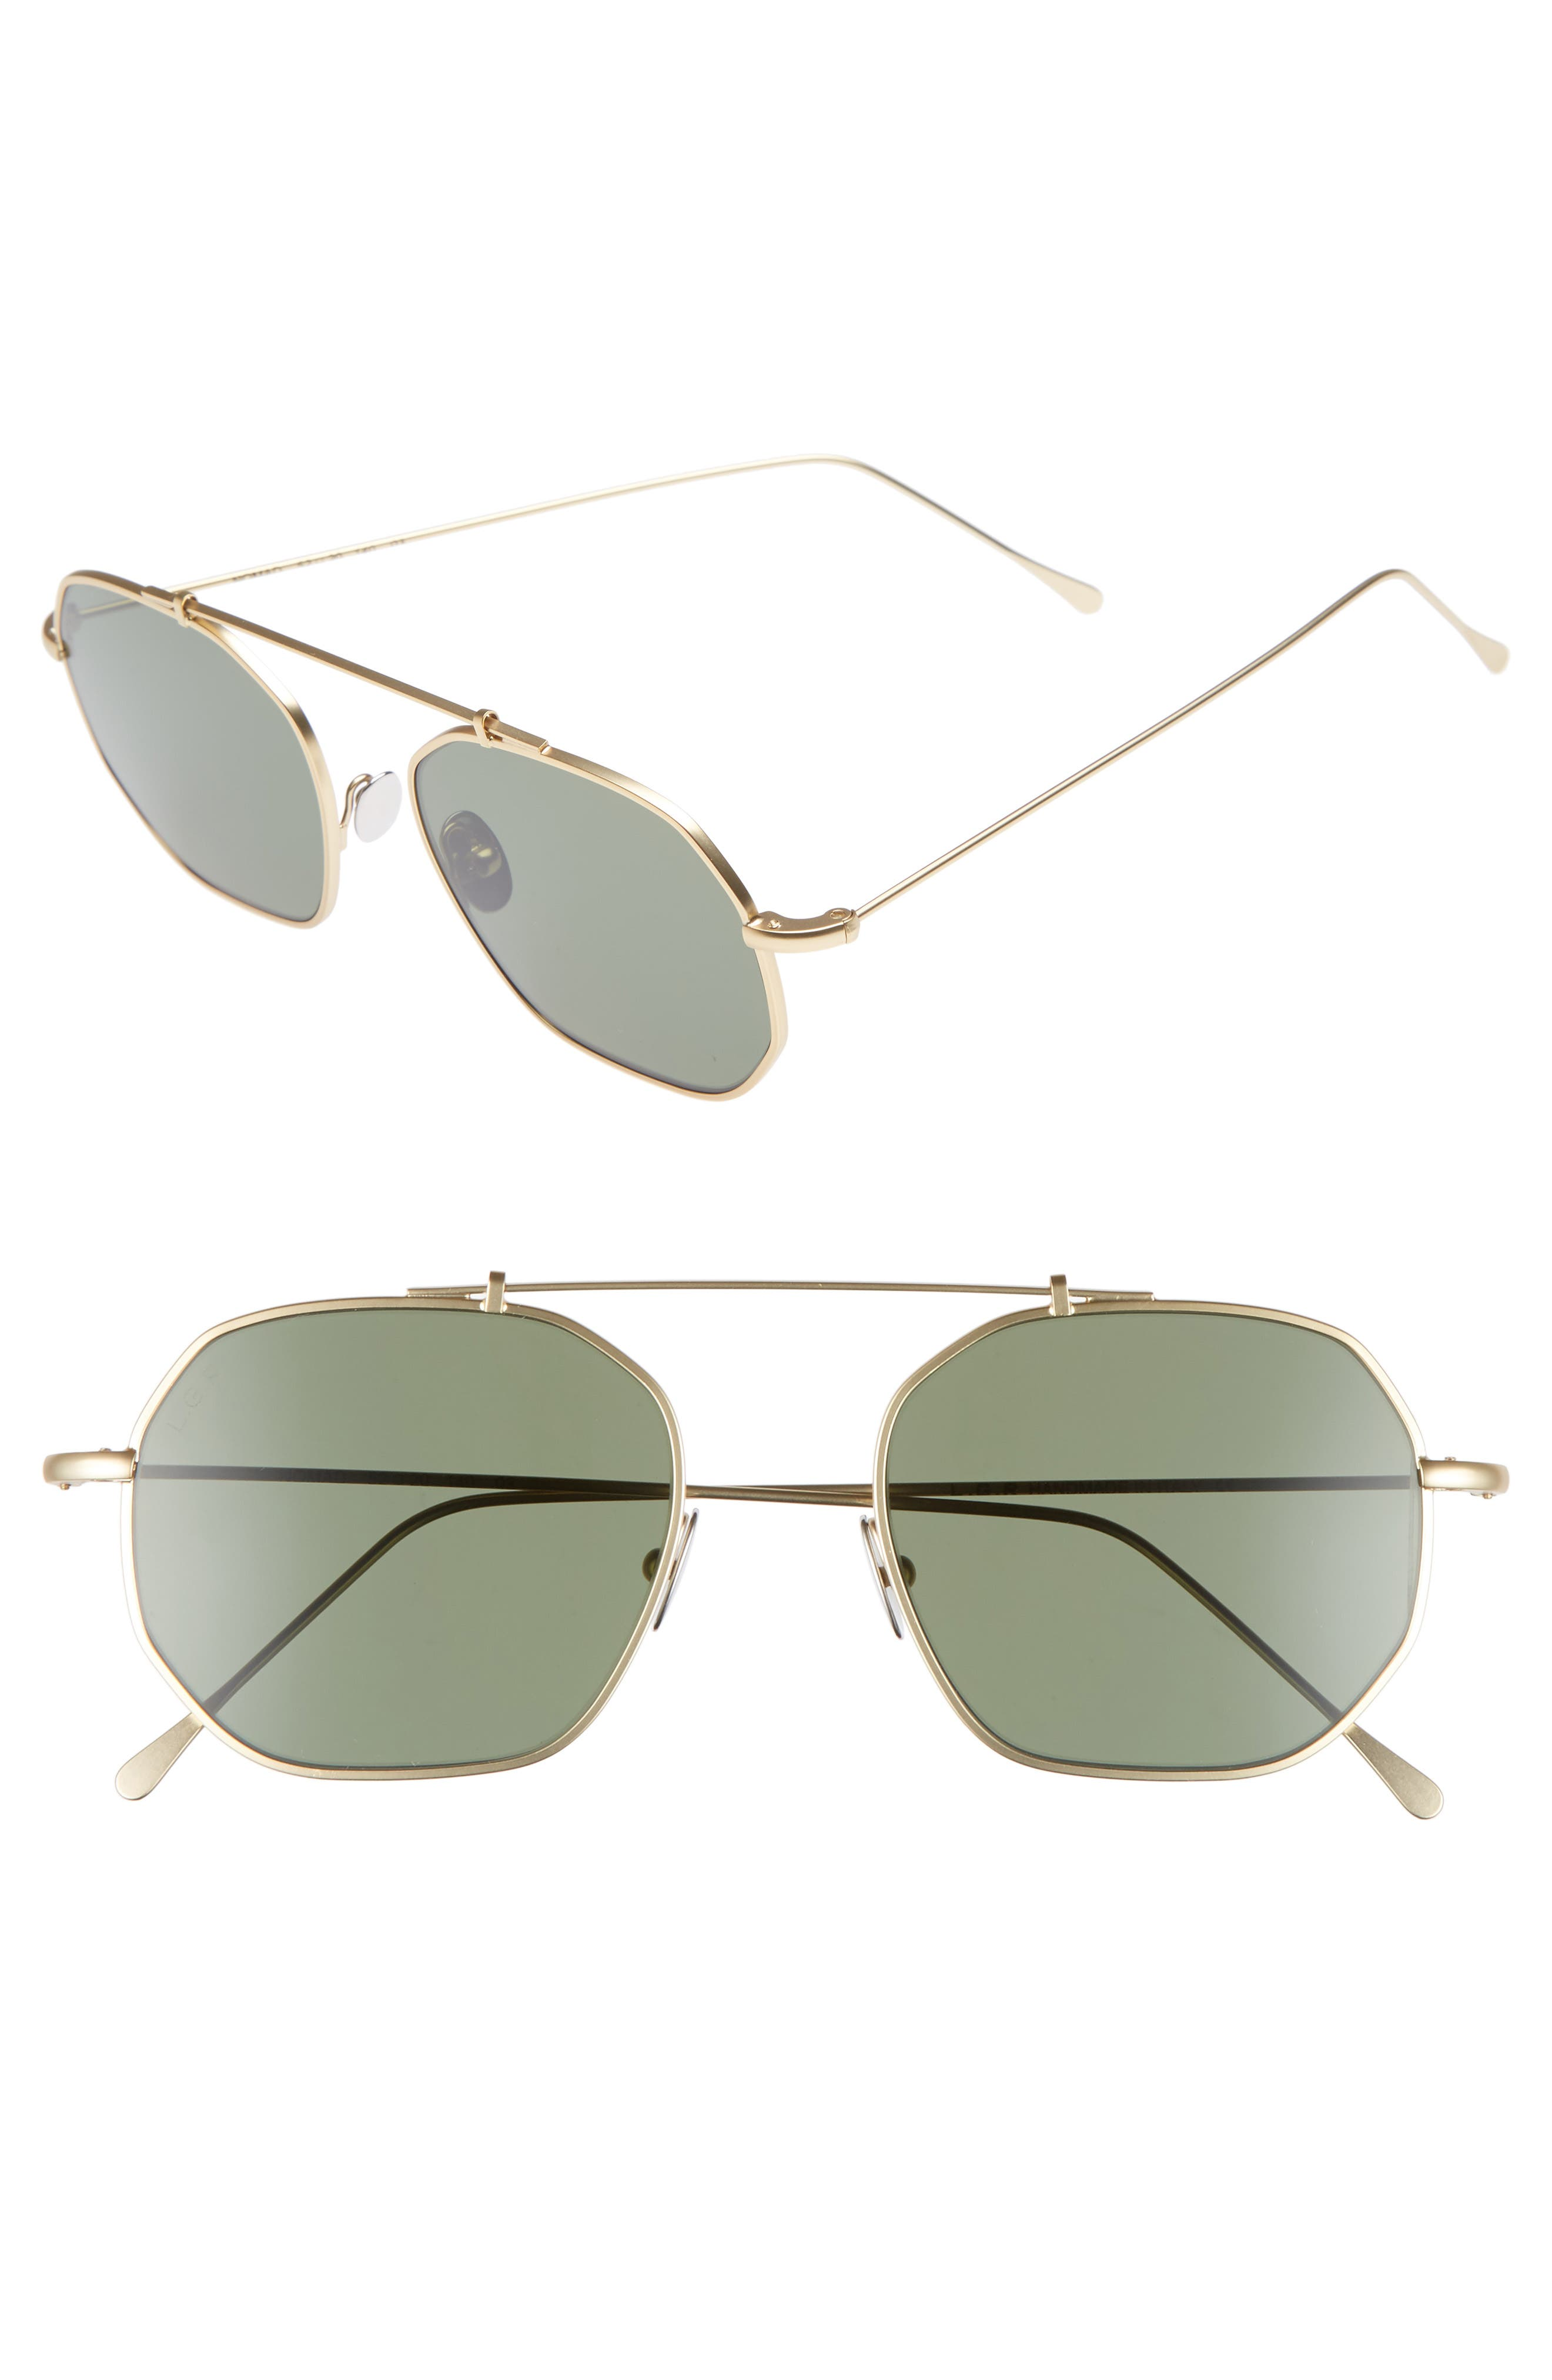 Nomad 52mm Sunglasses,                             Main thumbnail 2, color,